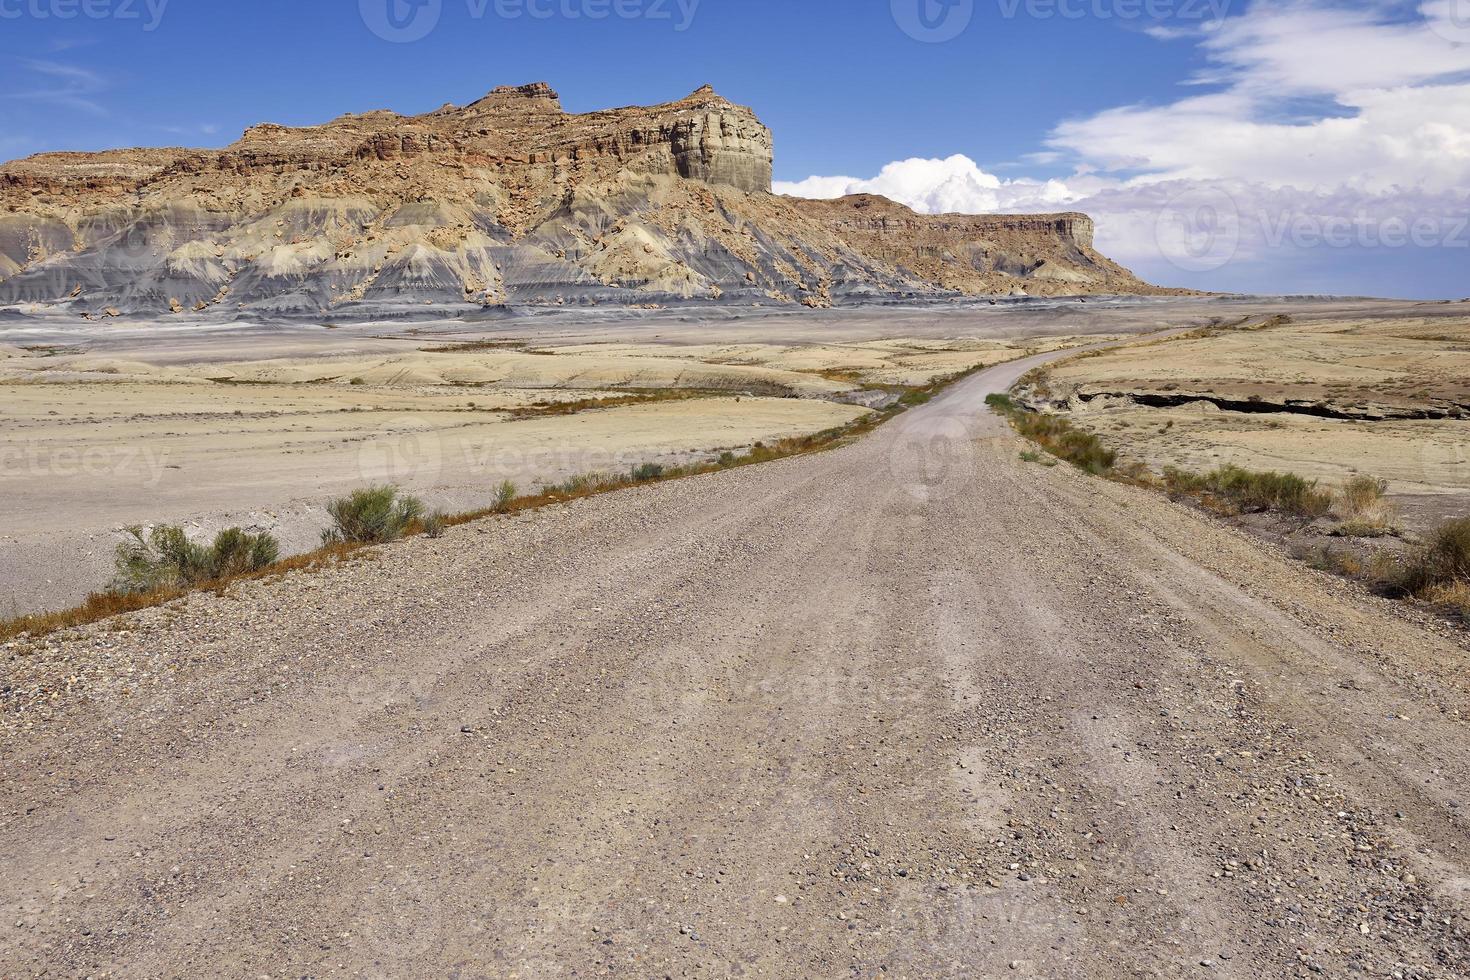 Desert Dirt Road photo